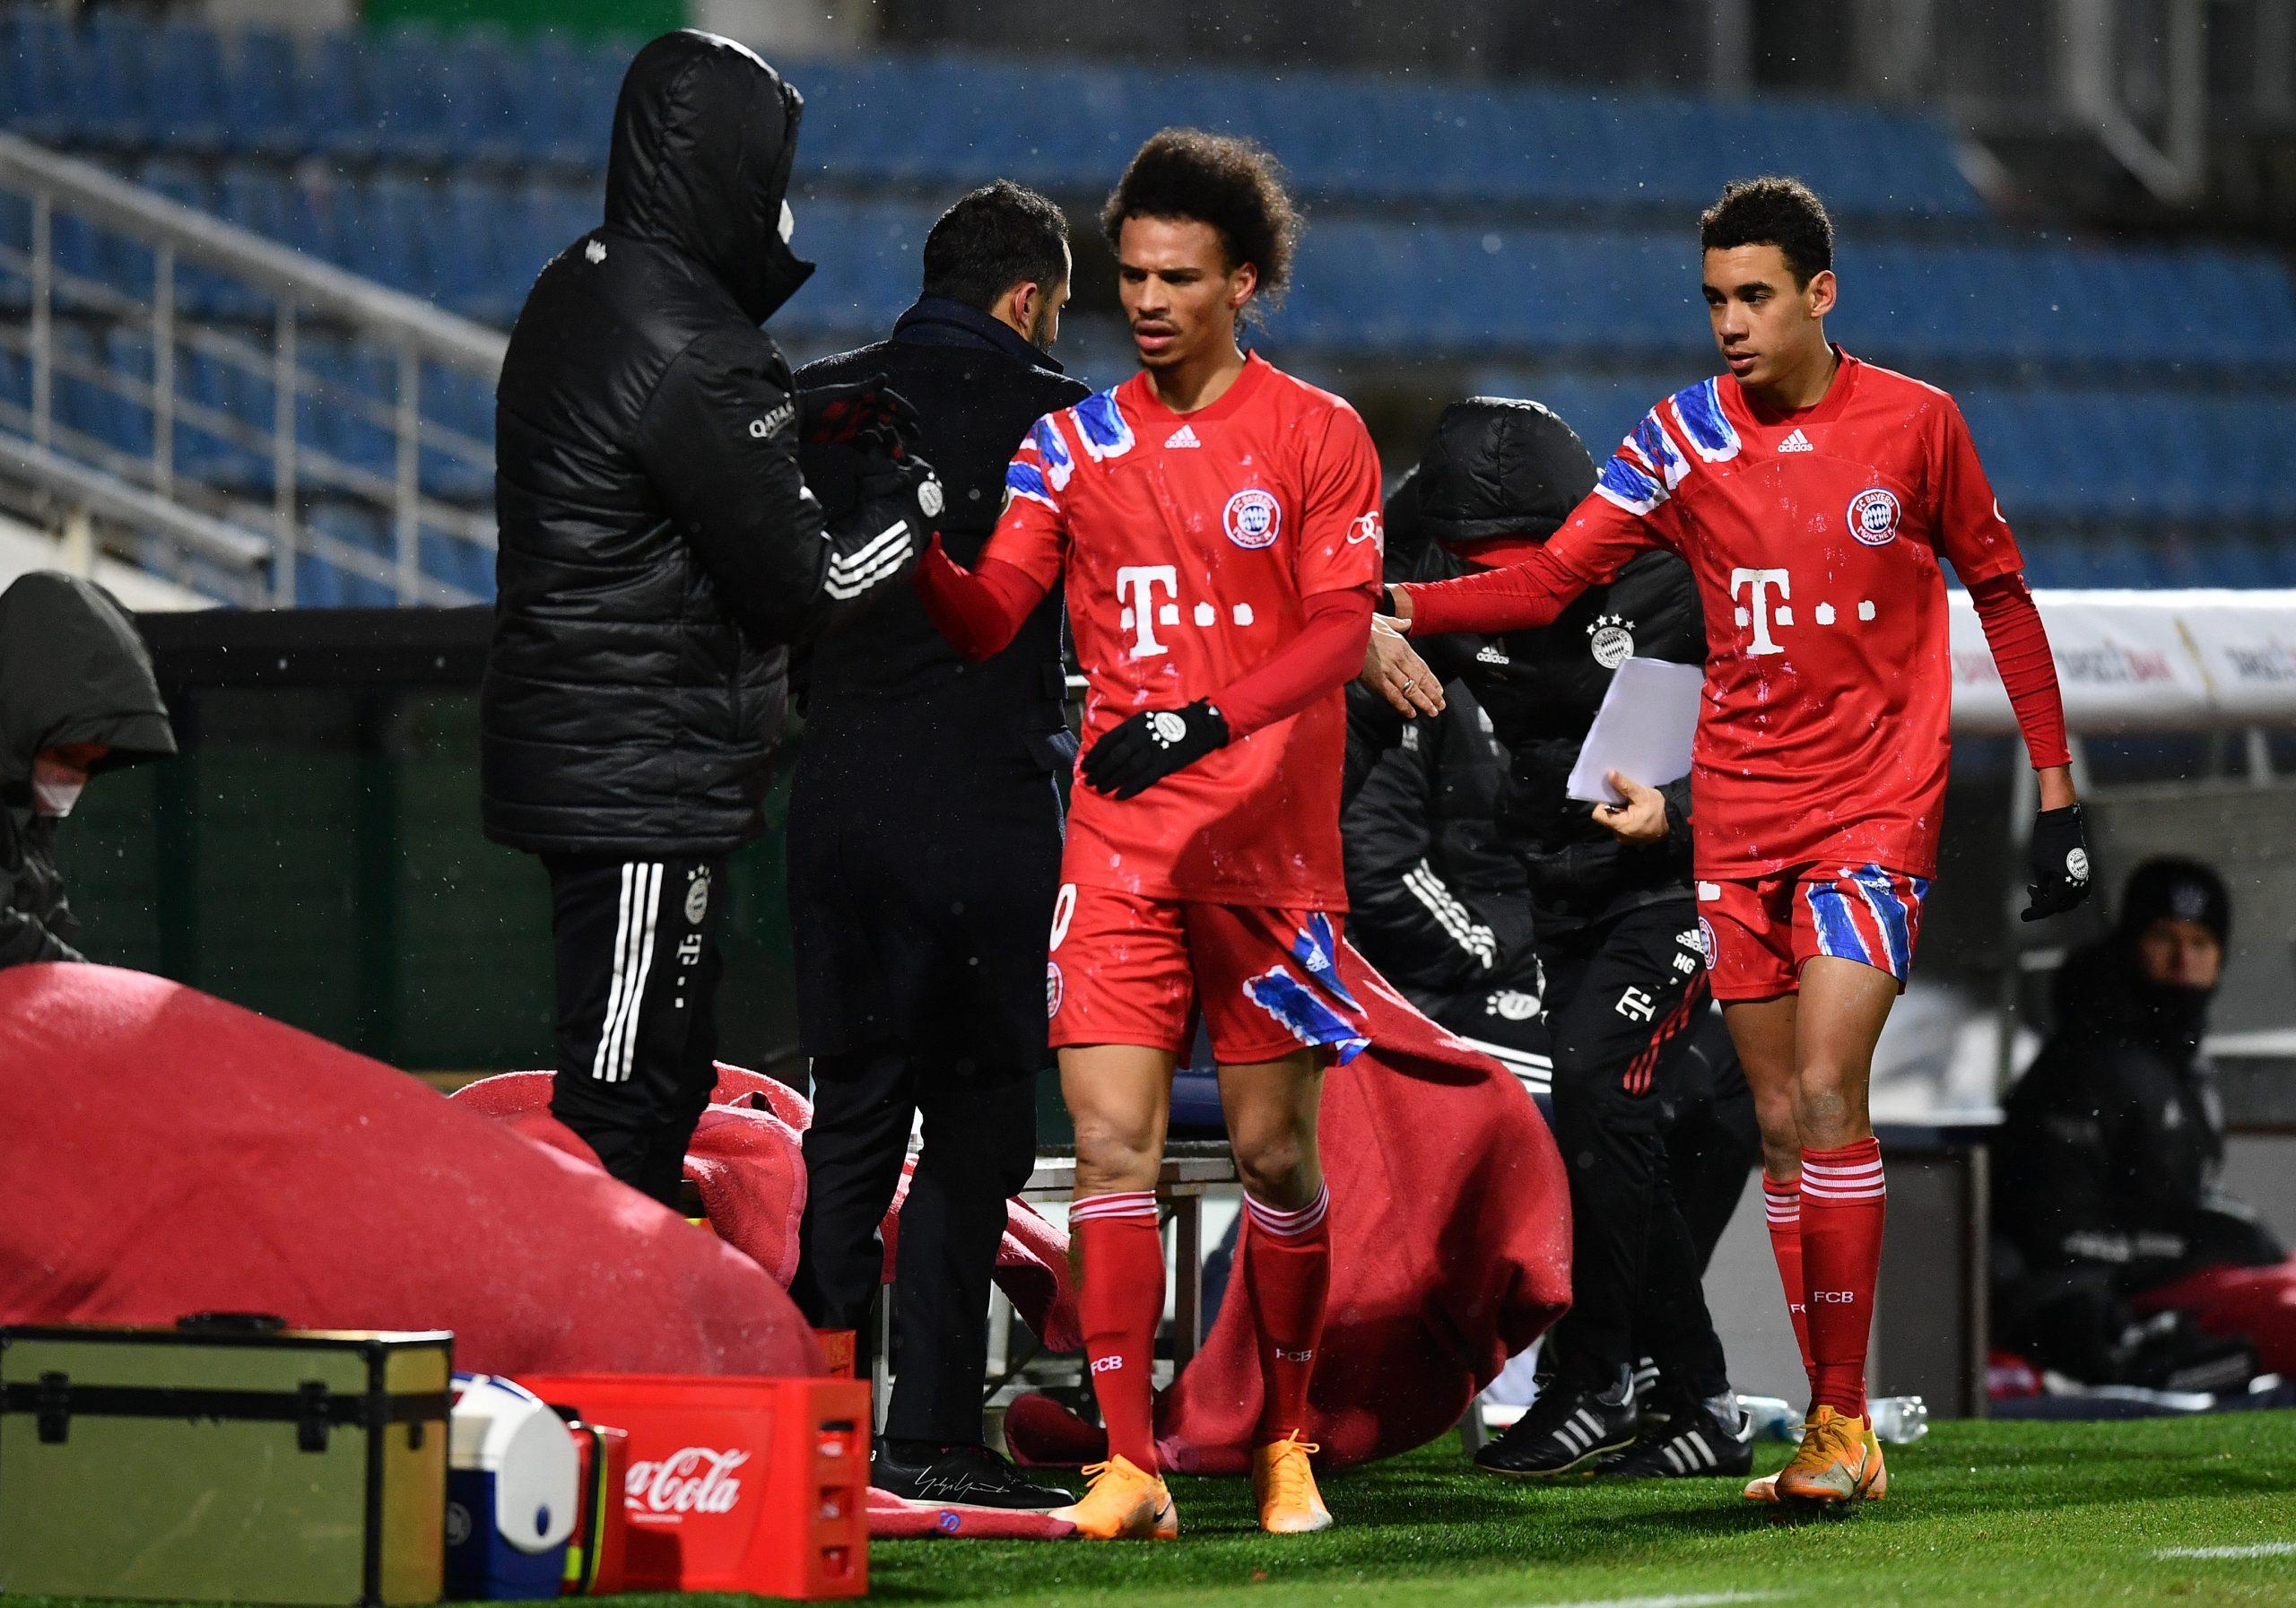 Jamal Musiala: Transfer Rumours Add To Bayern Munich's Problems